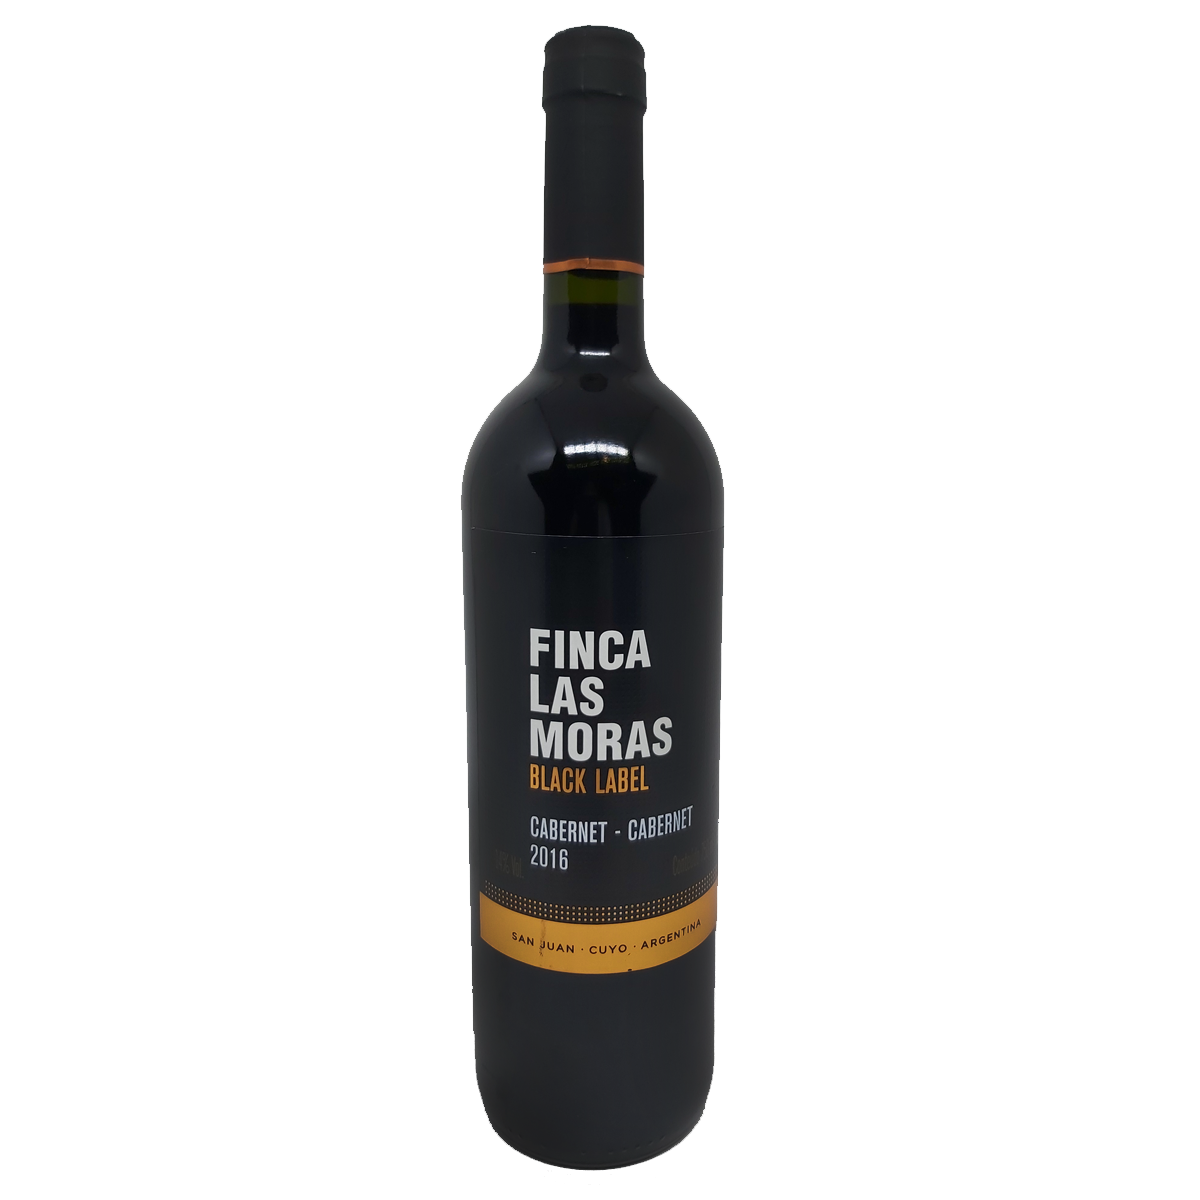 Vinho Tinto Argentino Finca Las Moras Black Label Carbernet